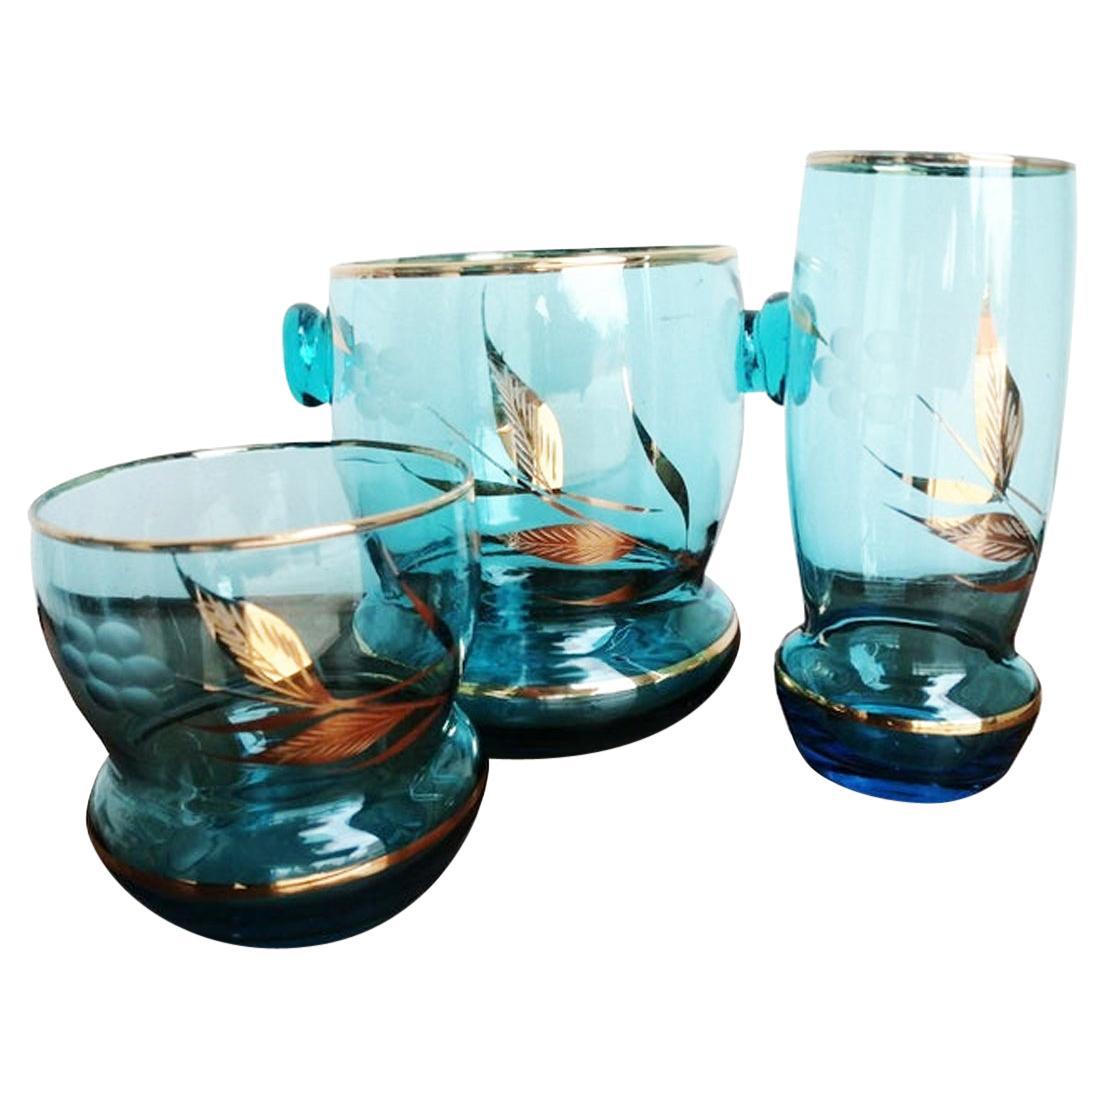 12 Glasses & Ice Bucket Bohemian Crystal Czechoslovakia, 1950s